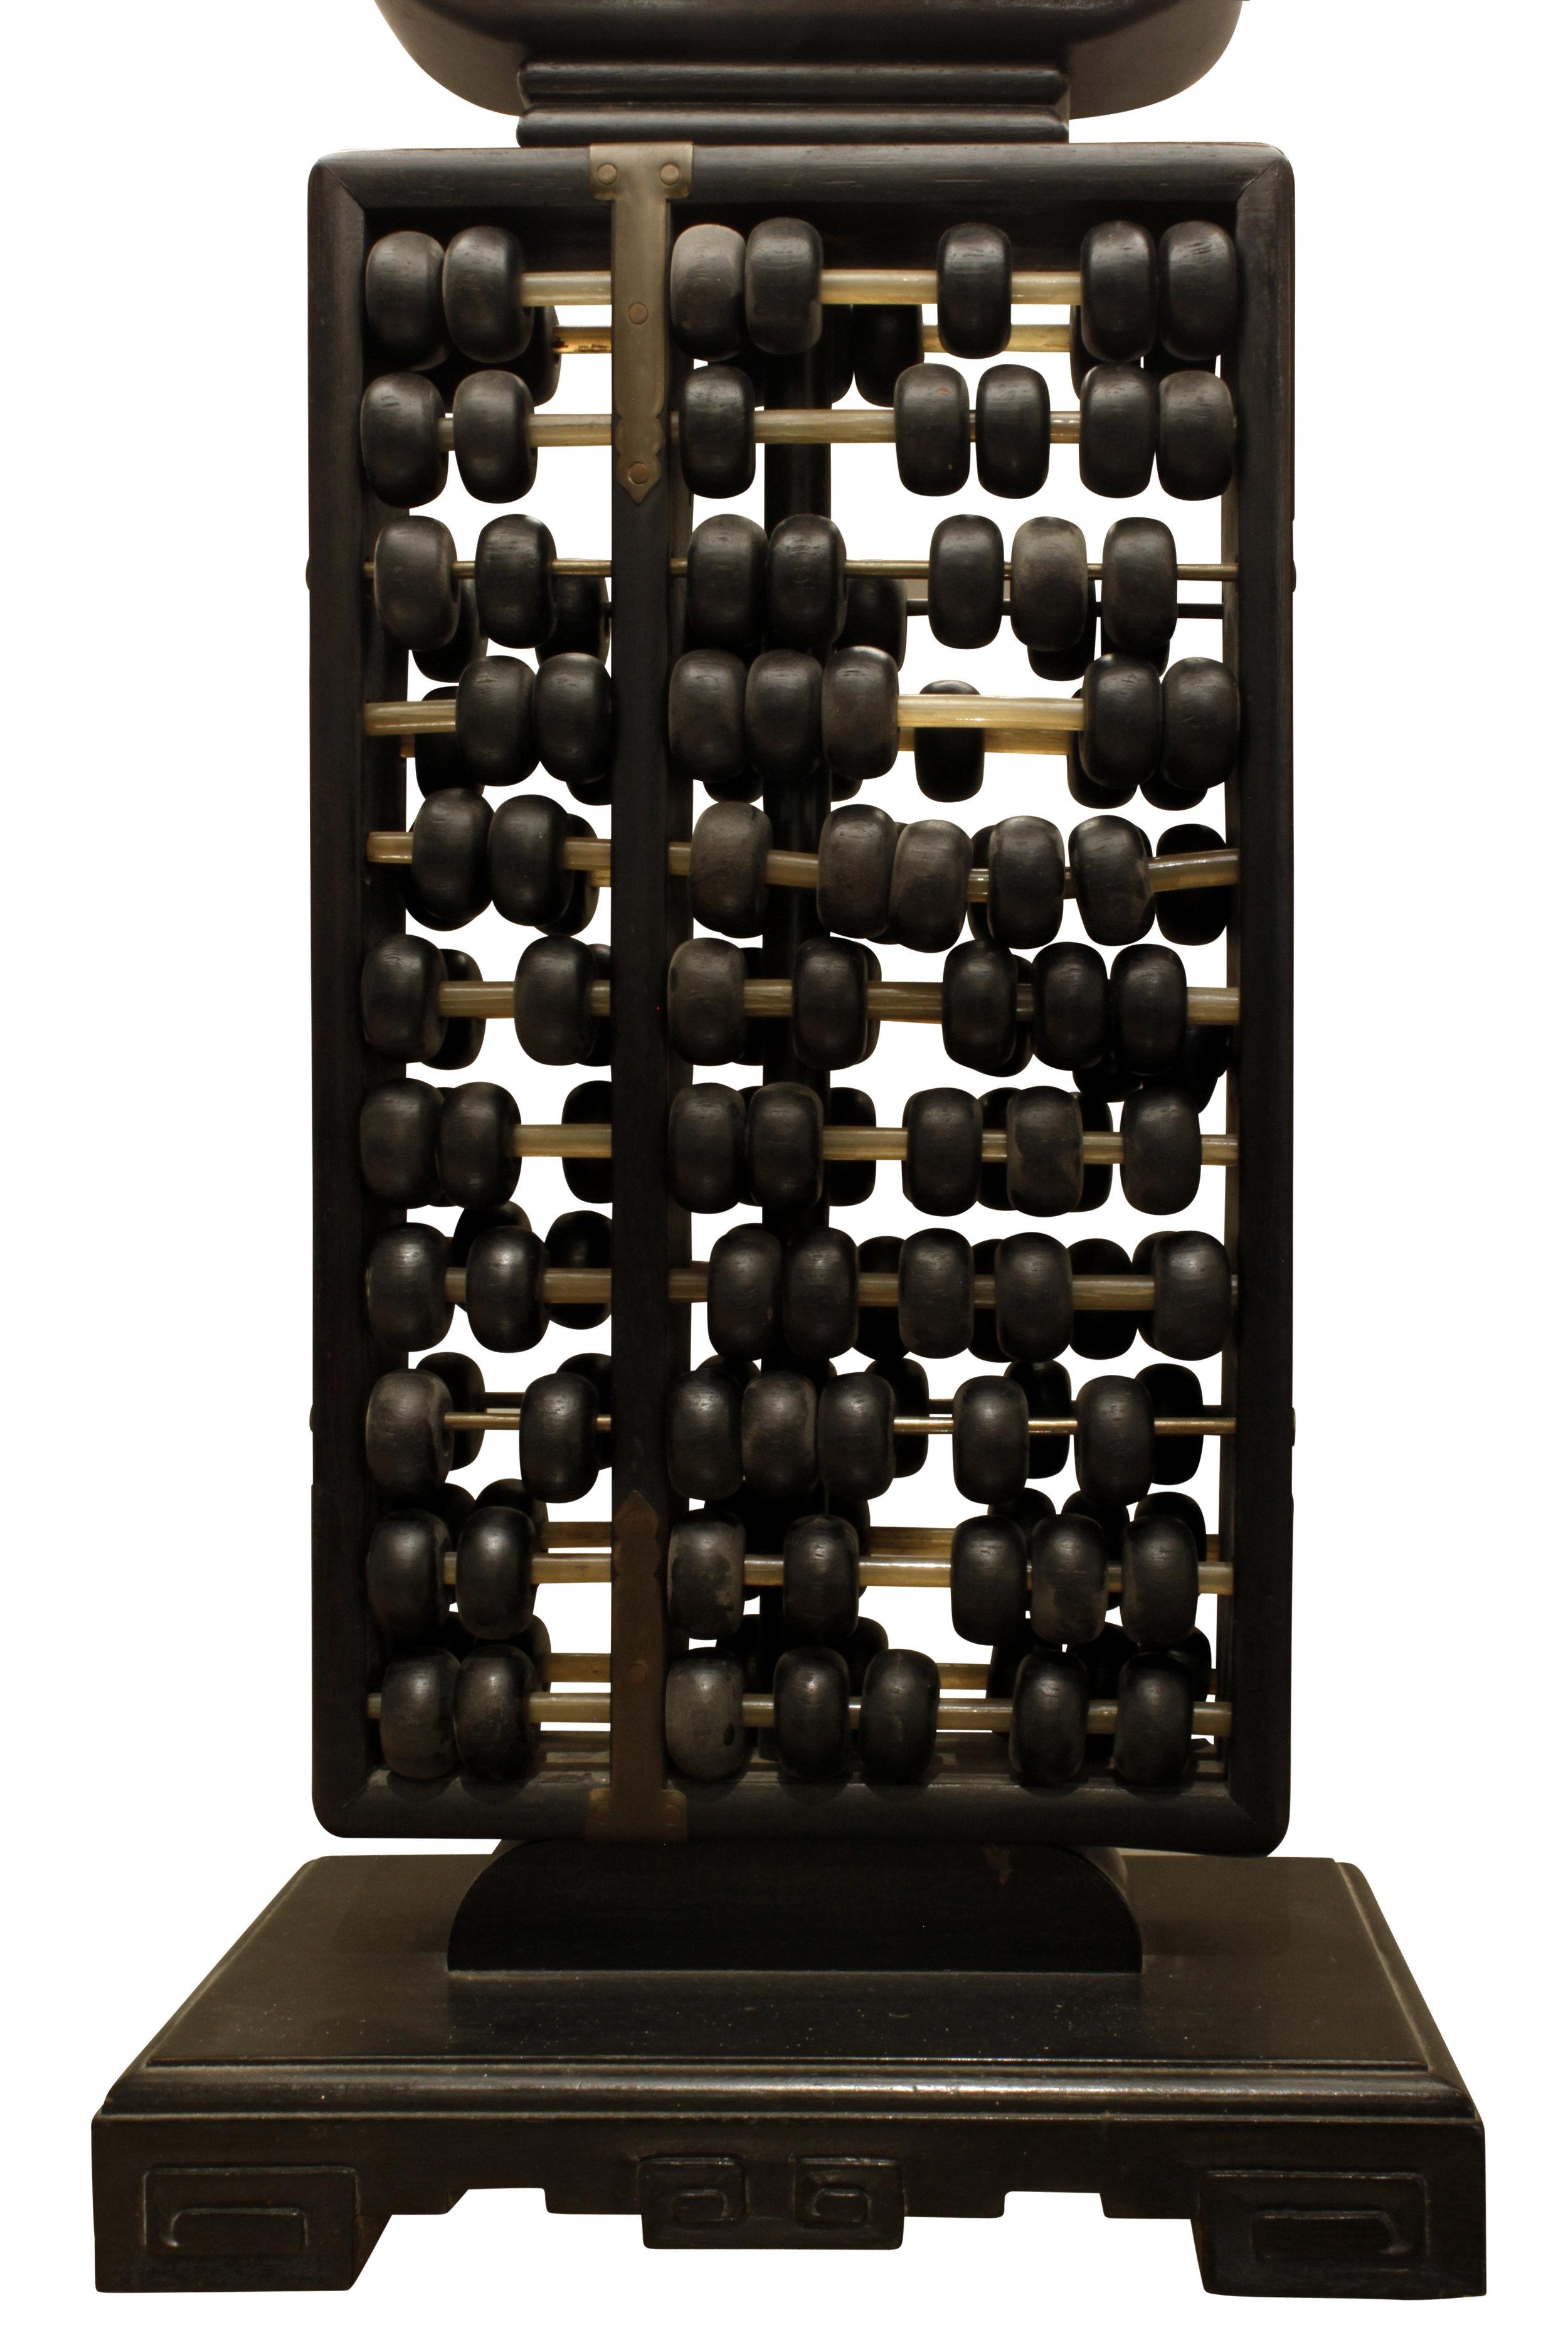 Abacus 25 1940s tablelamp96 mid dtl.JPG